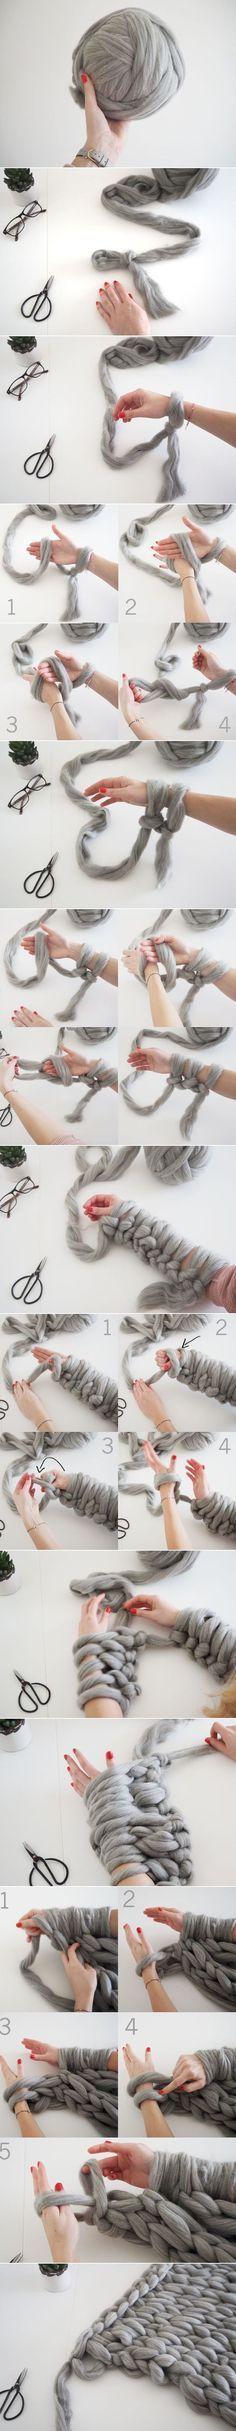 DIY - Knit a chunky blanket from wool roving 17 Cozy DIY Projects to Keep You Warm This WinterDIY - Knit a rough blanket of wool roving - Gis K - - DIY – Stricken Sie eine grobe Decke aus Wolle Roving DIY – Knit a Rough Roving Wool Blanket 17 coz Knitting Projects, Crochet Projects, Sewing Projects, Craft Projects, Arm Knitting, Knitting Patterns, Crochet Patterns, Knitting Ideas, Yarn Crafts